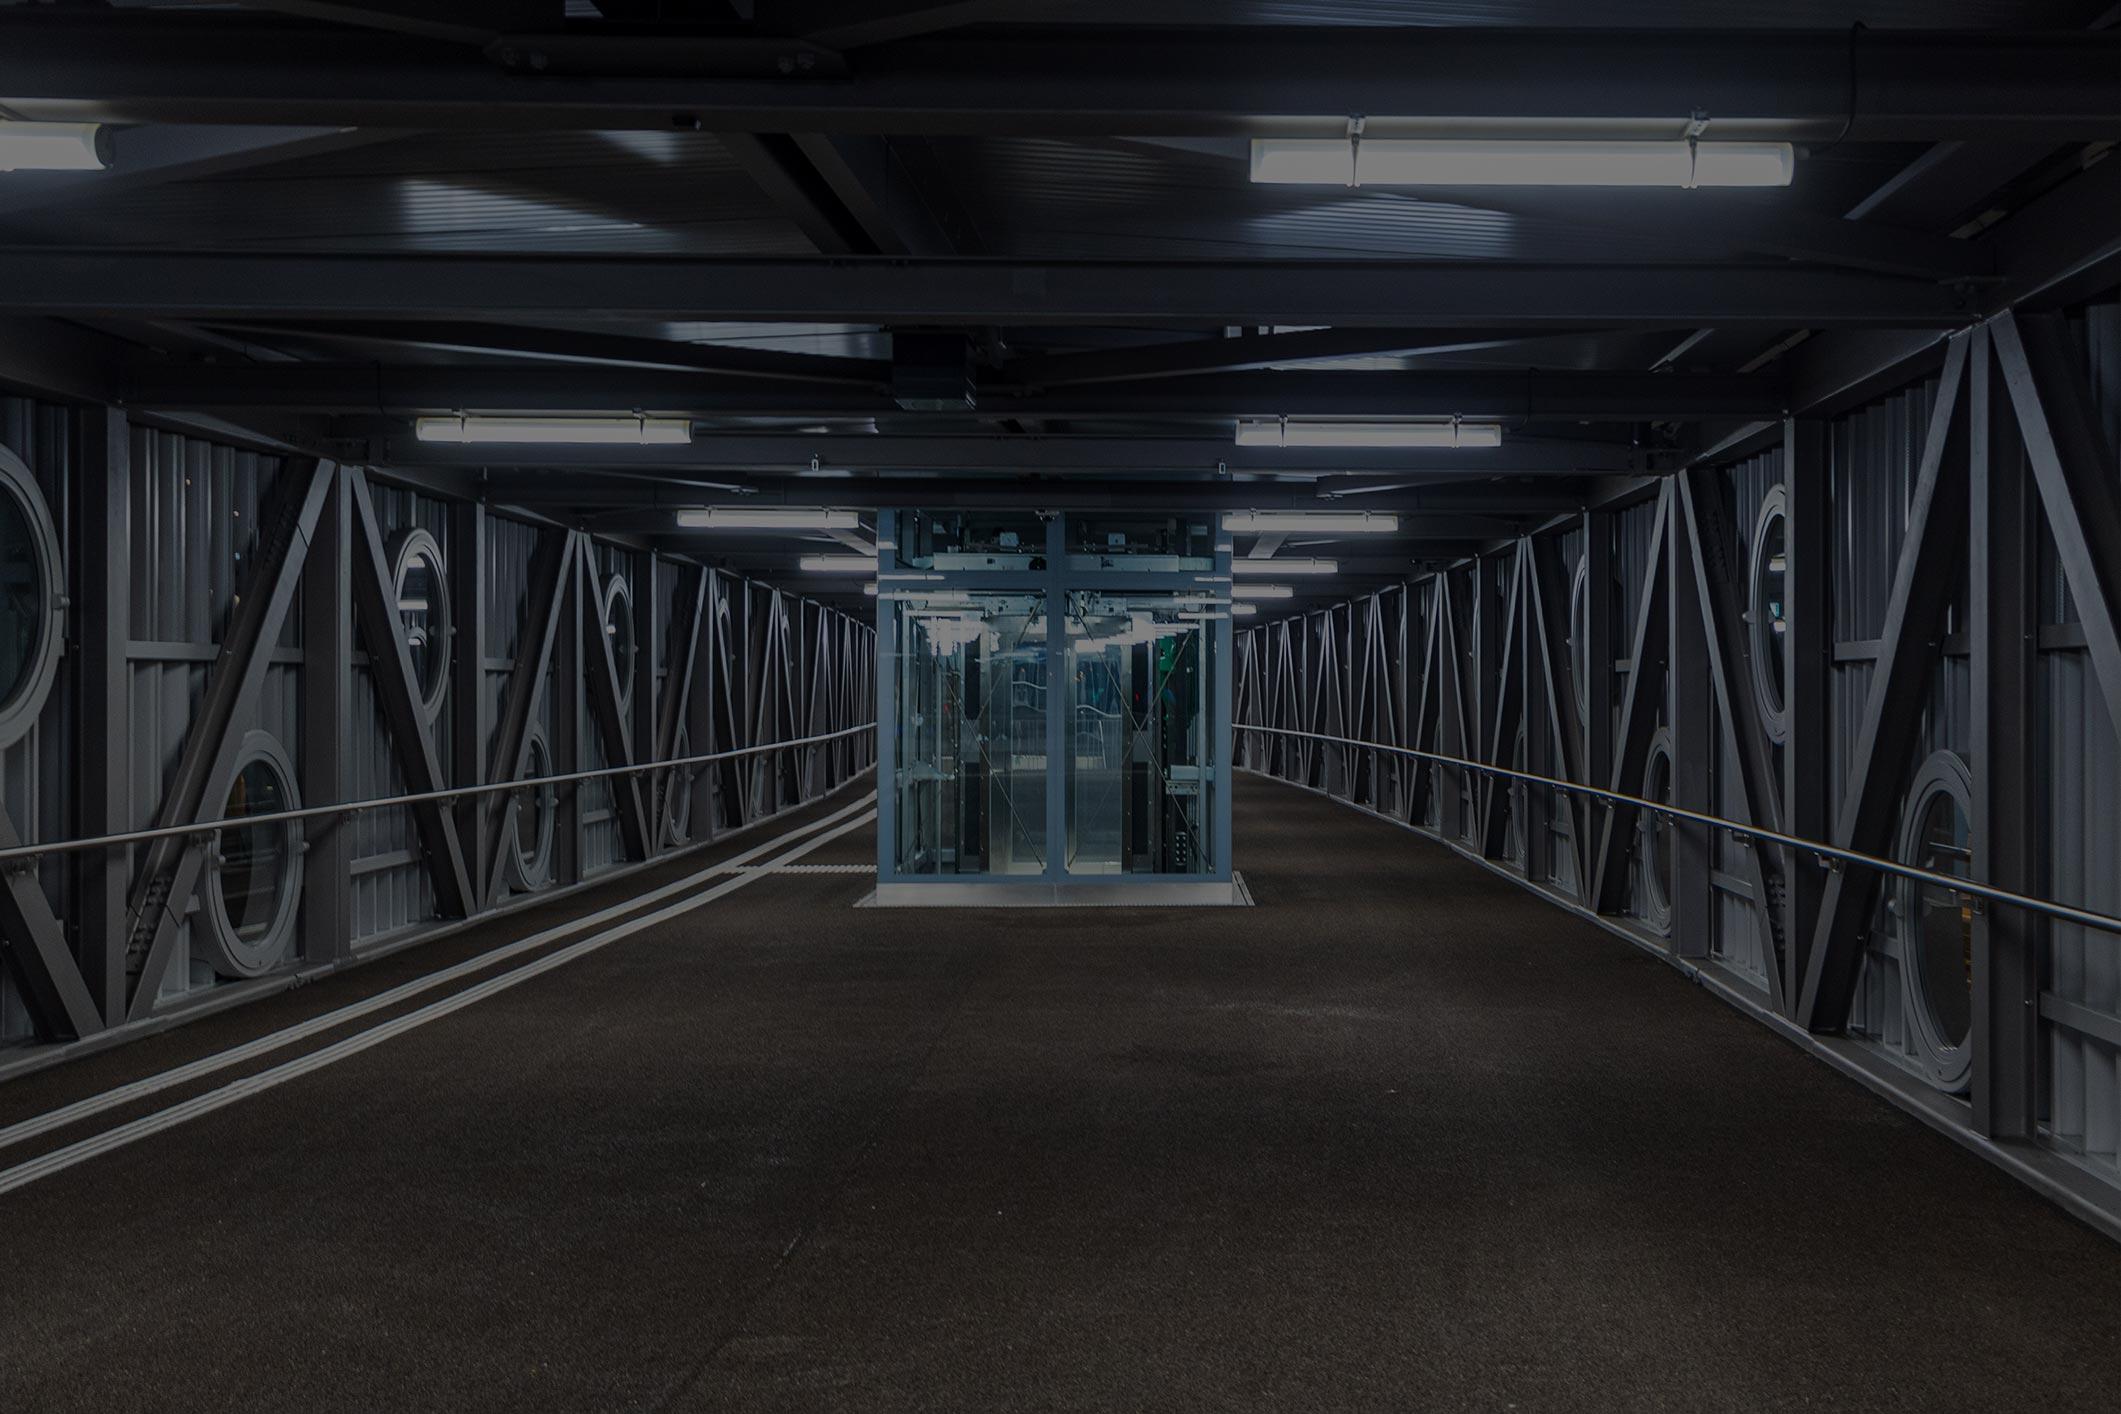 passage-centered-2121×1414